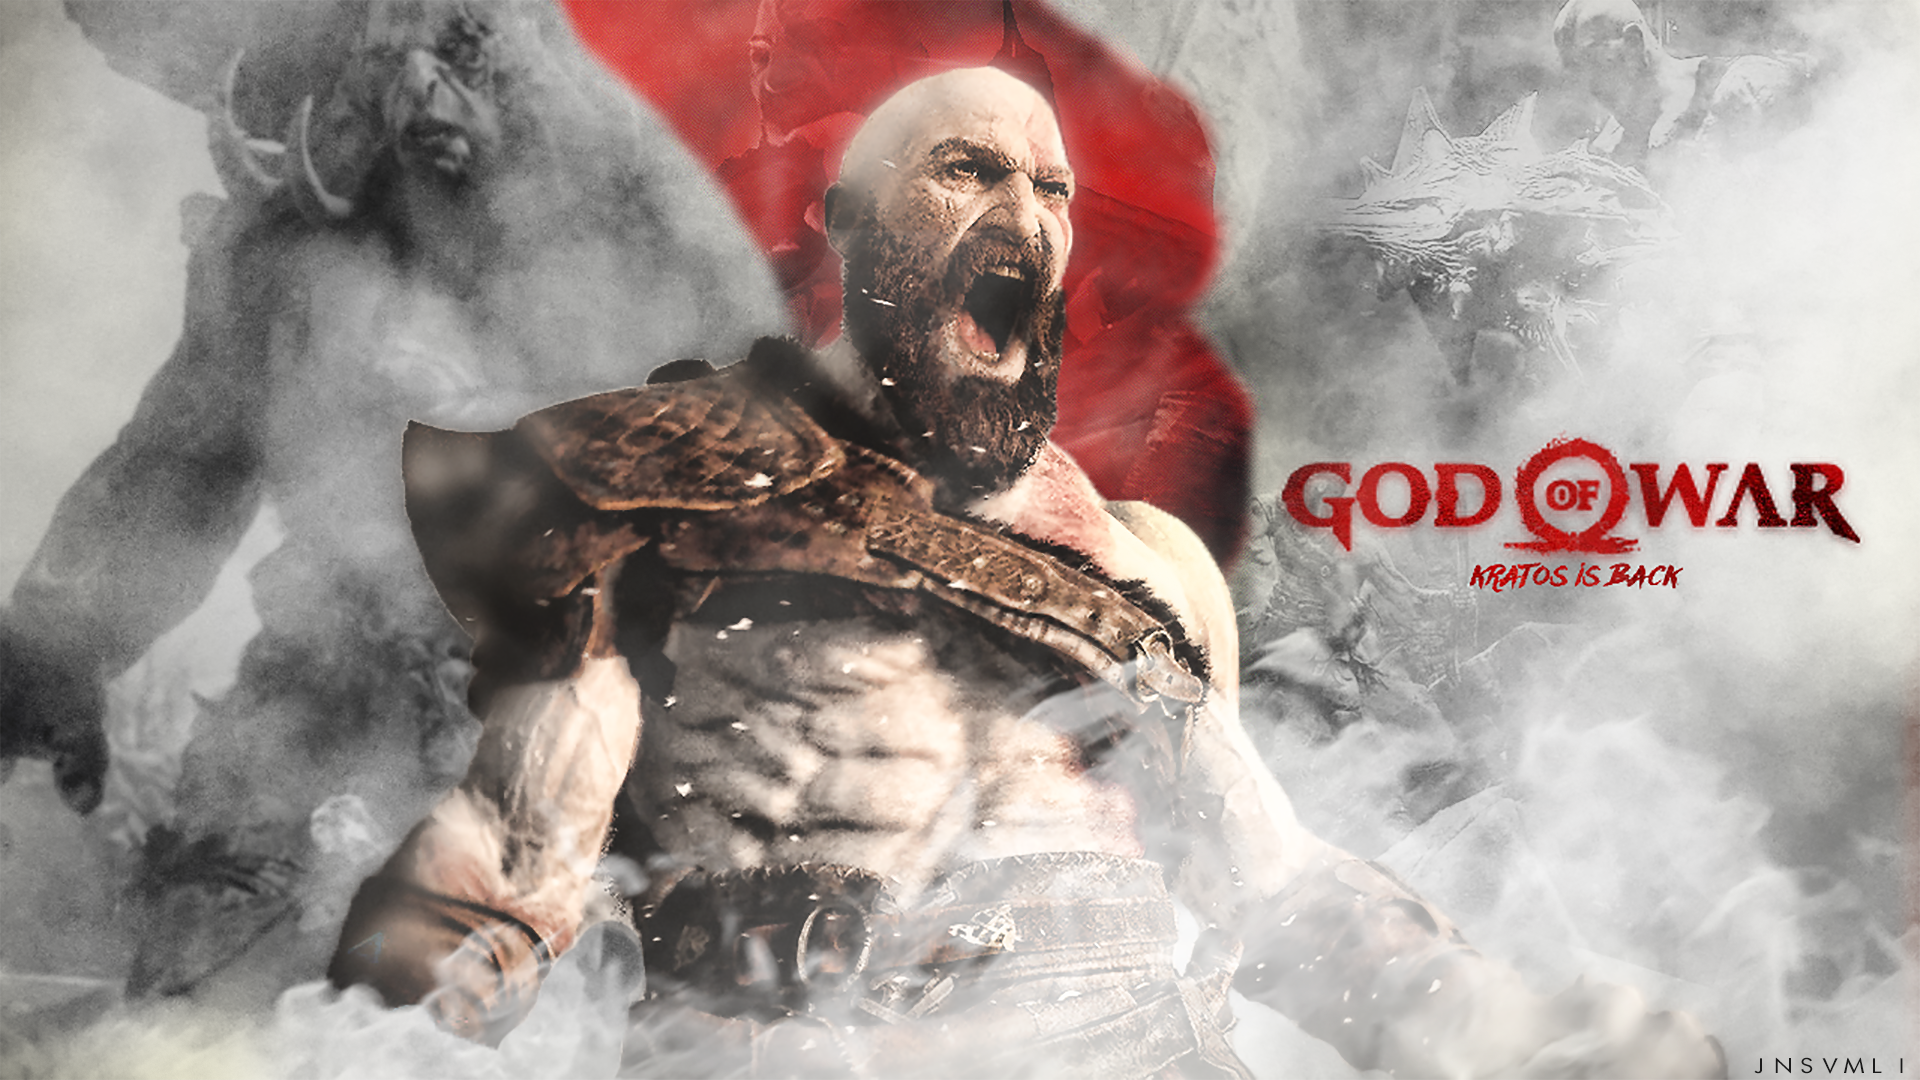 God Of War 4 Wallpaper V2 Jnsvmli By Jnsvmli On Deviantart